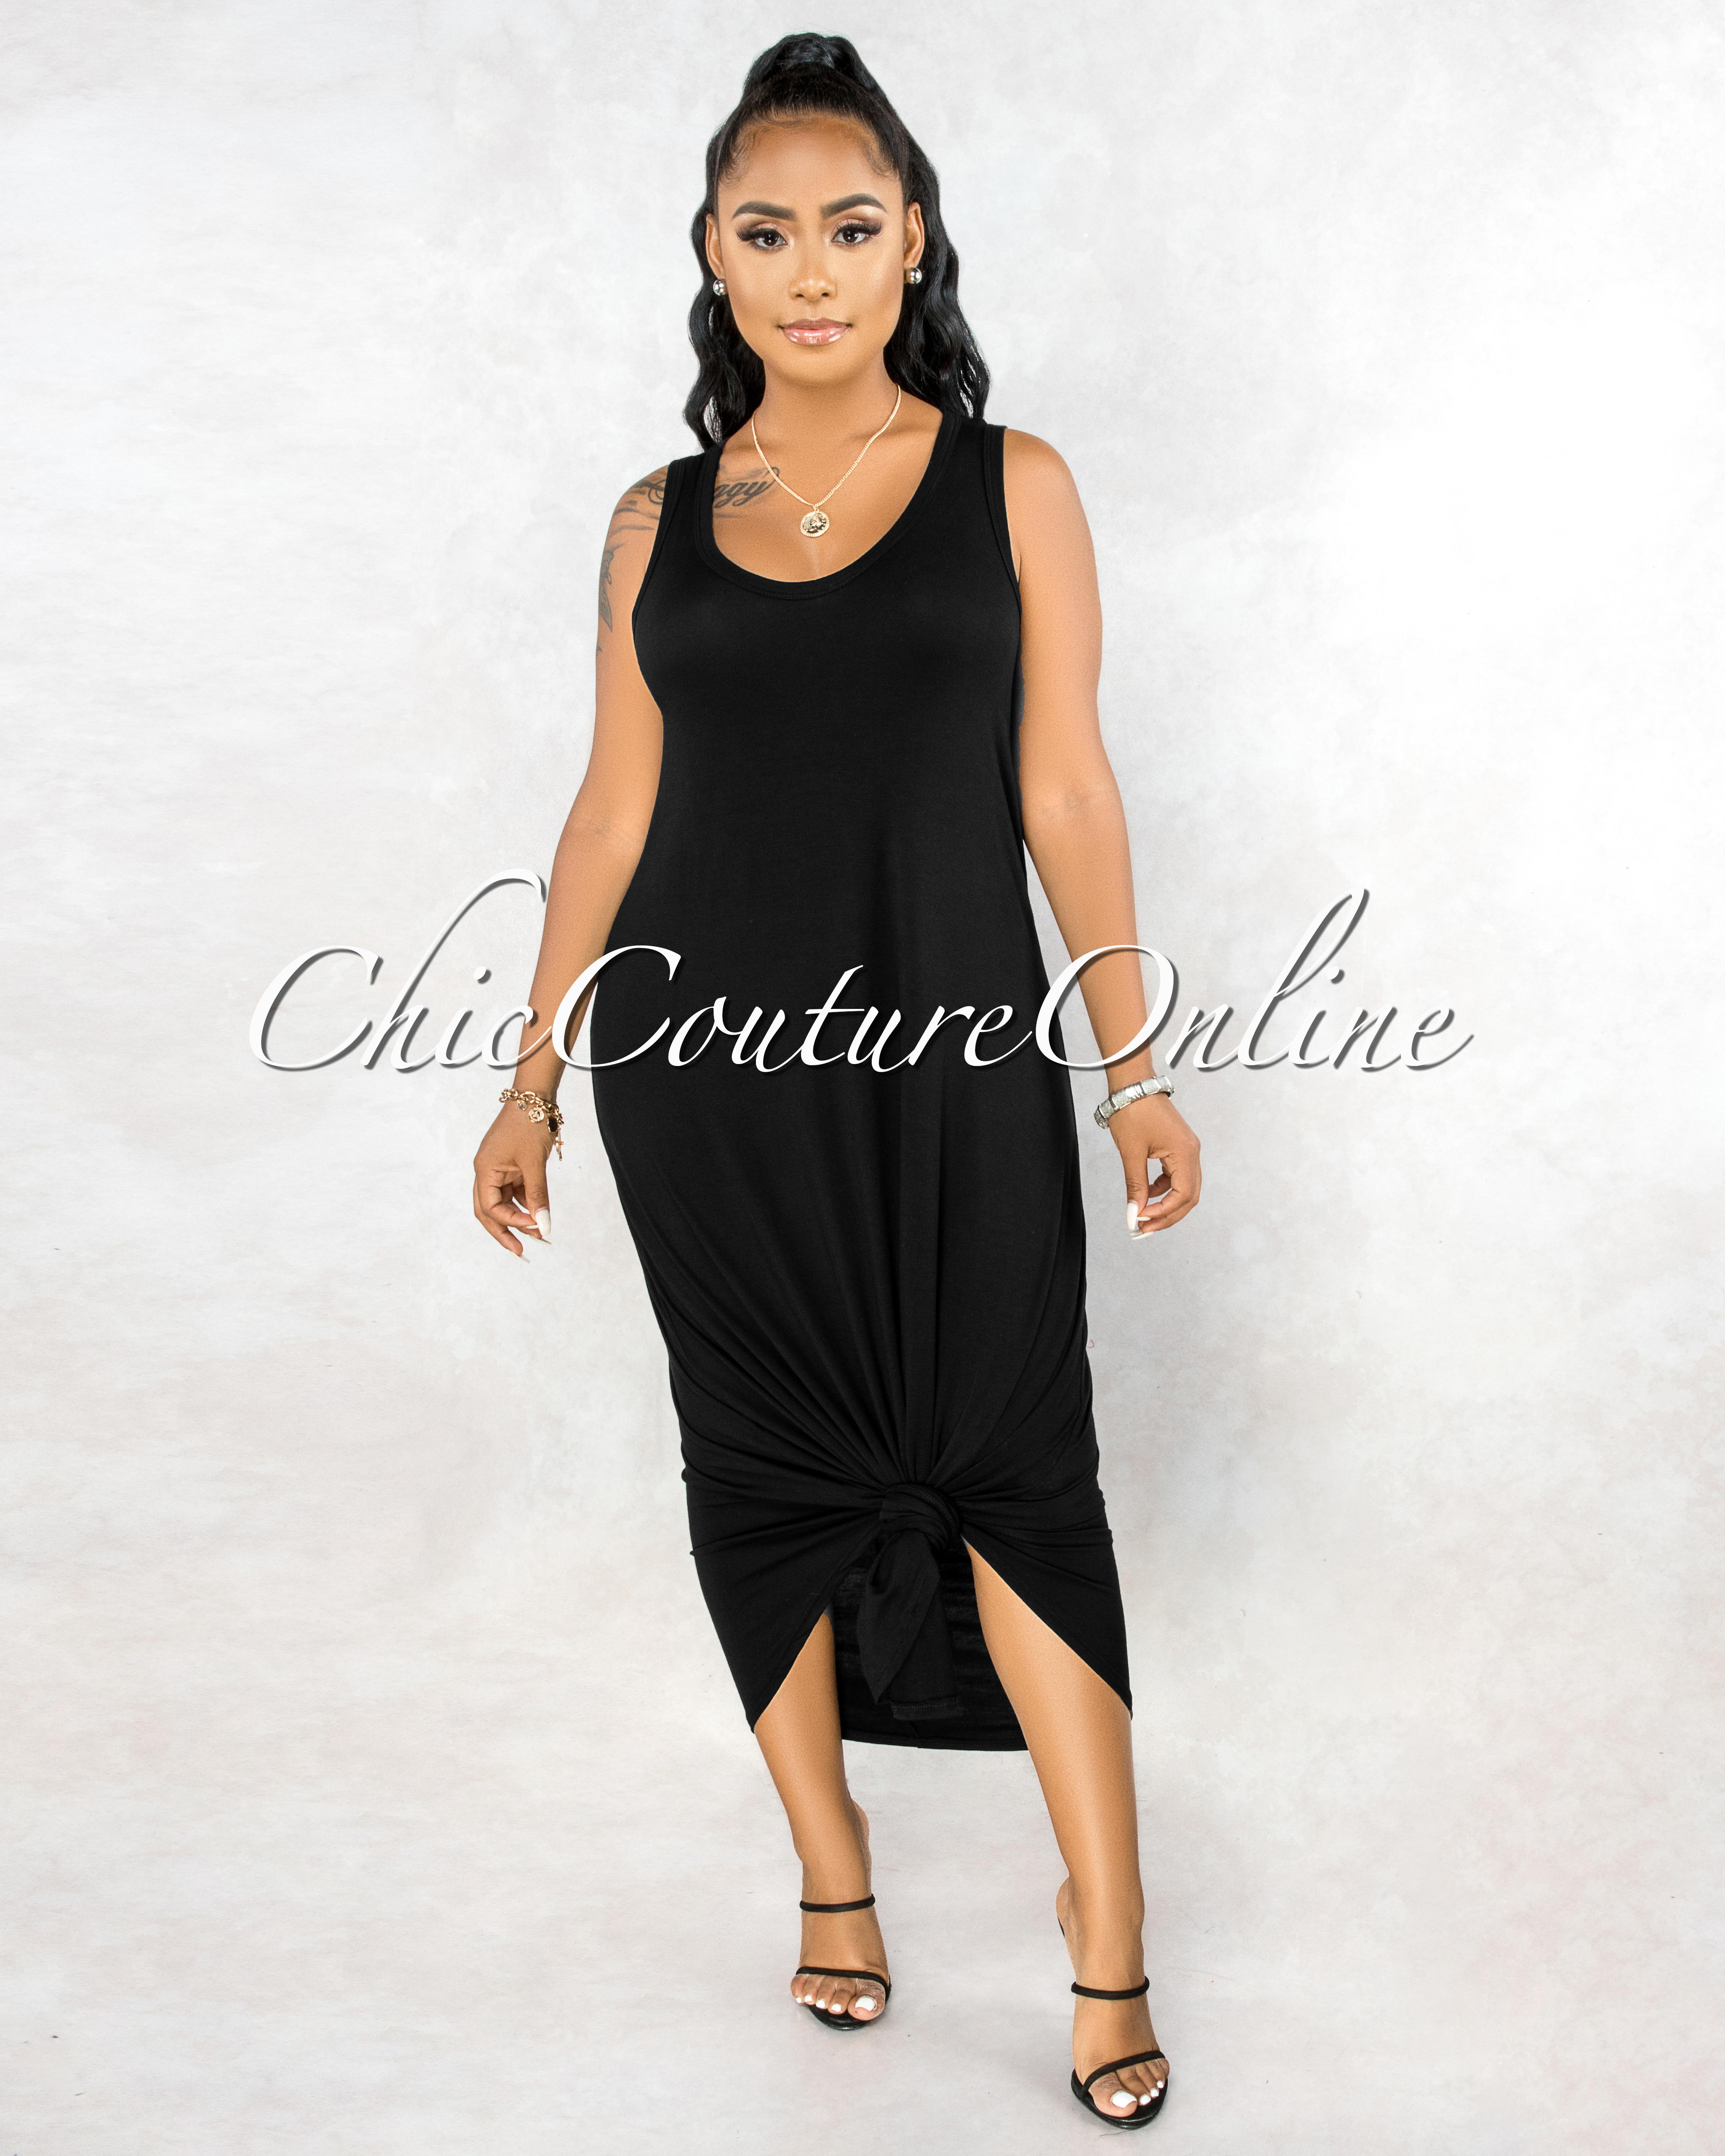 Adonia Black Body-Con Tank CURVACEOUS Maxi Dress